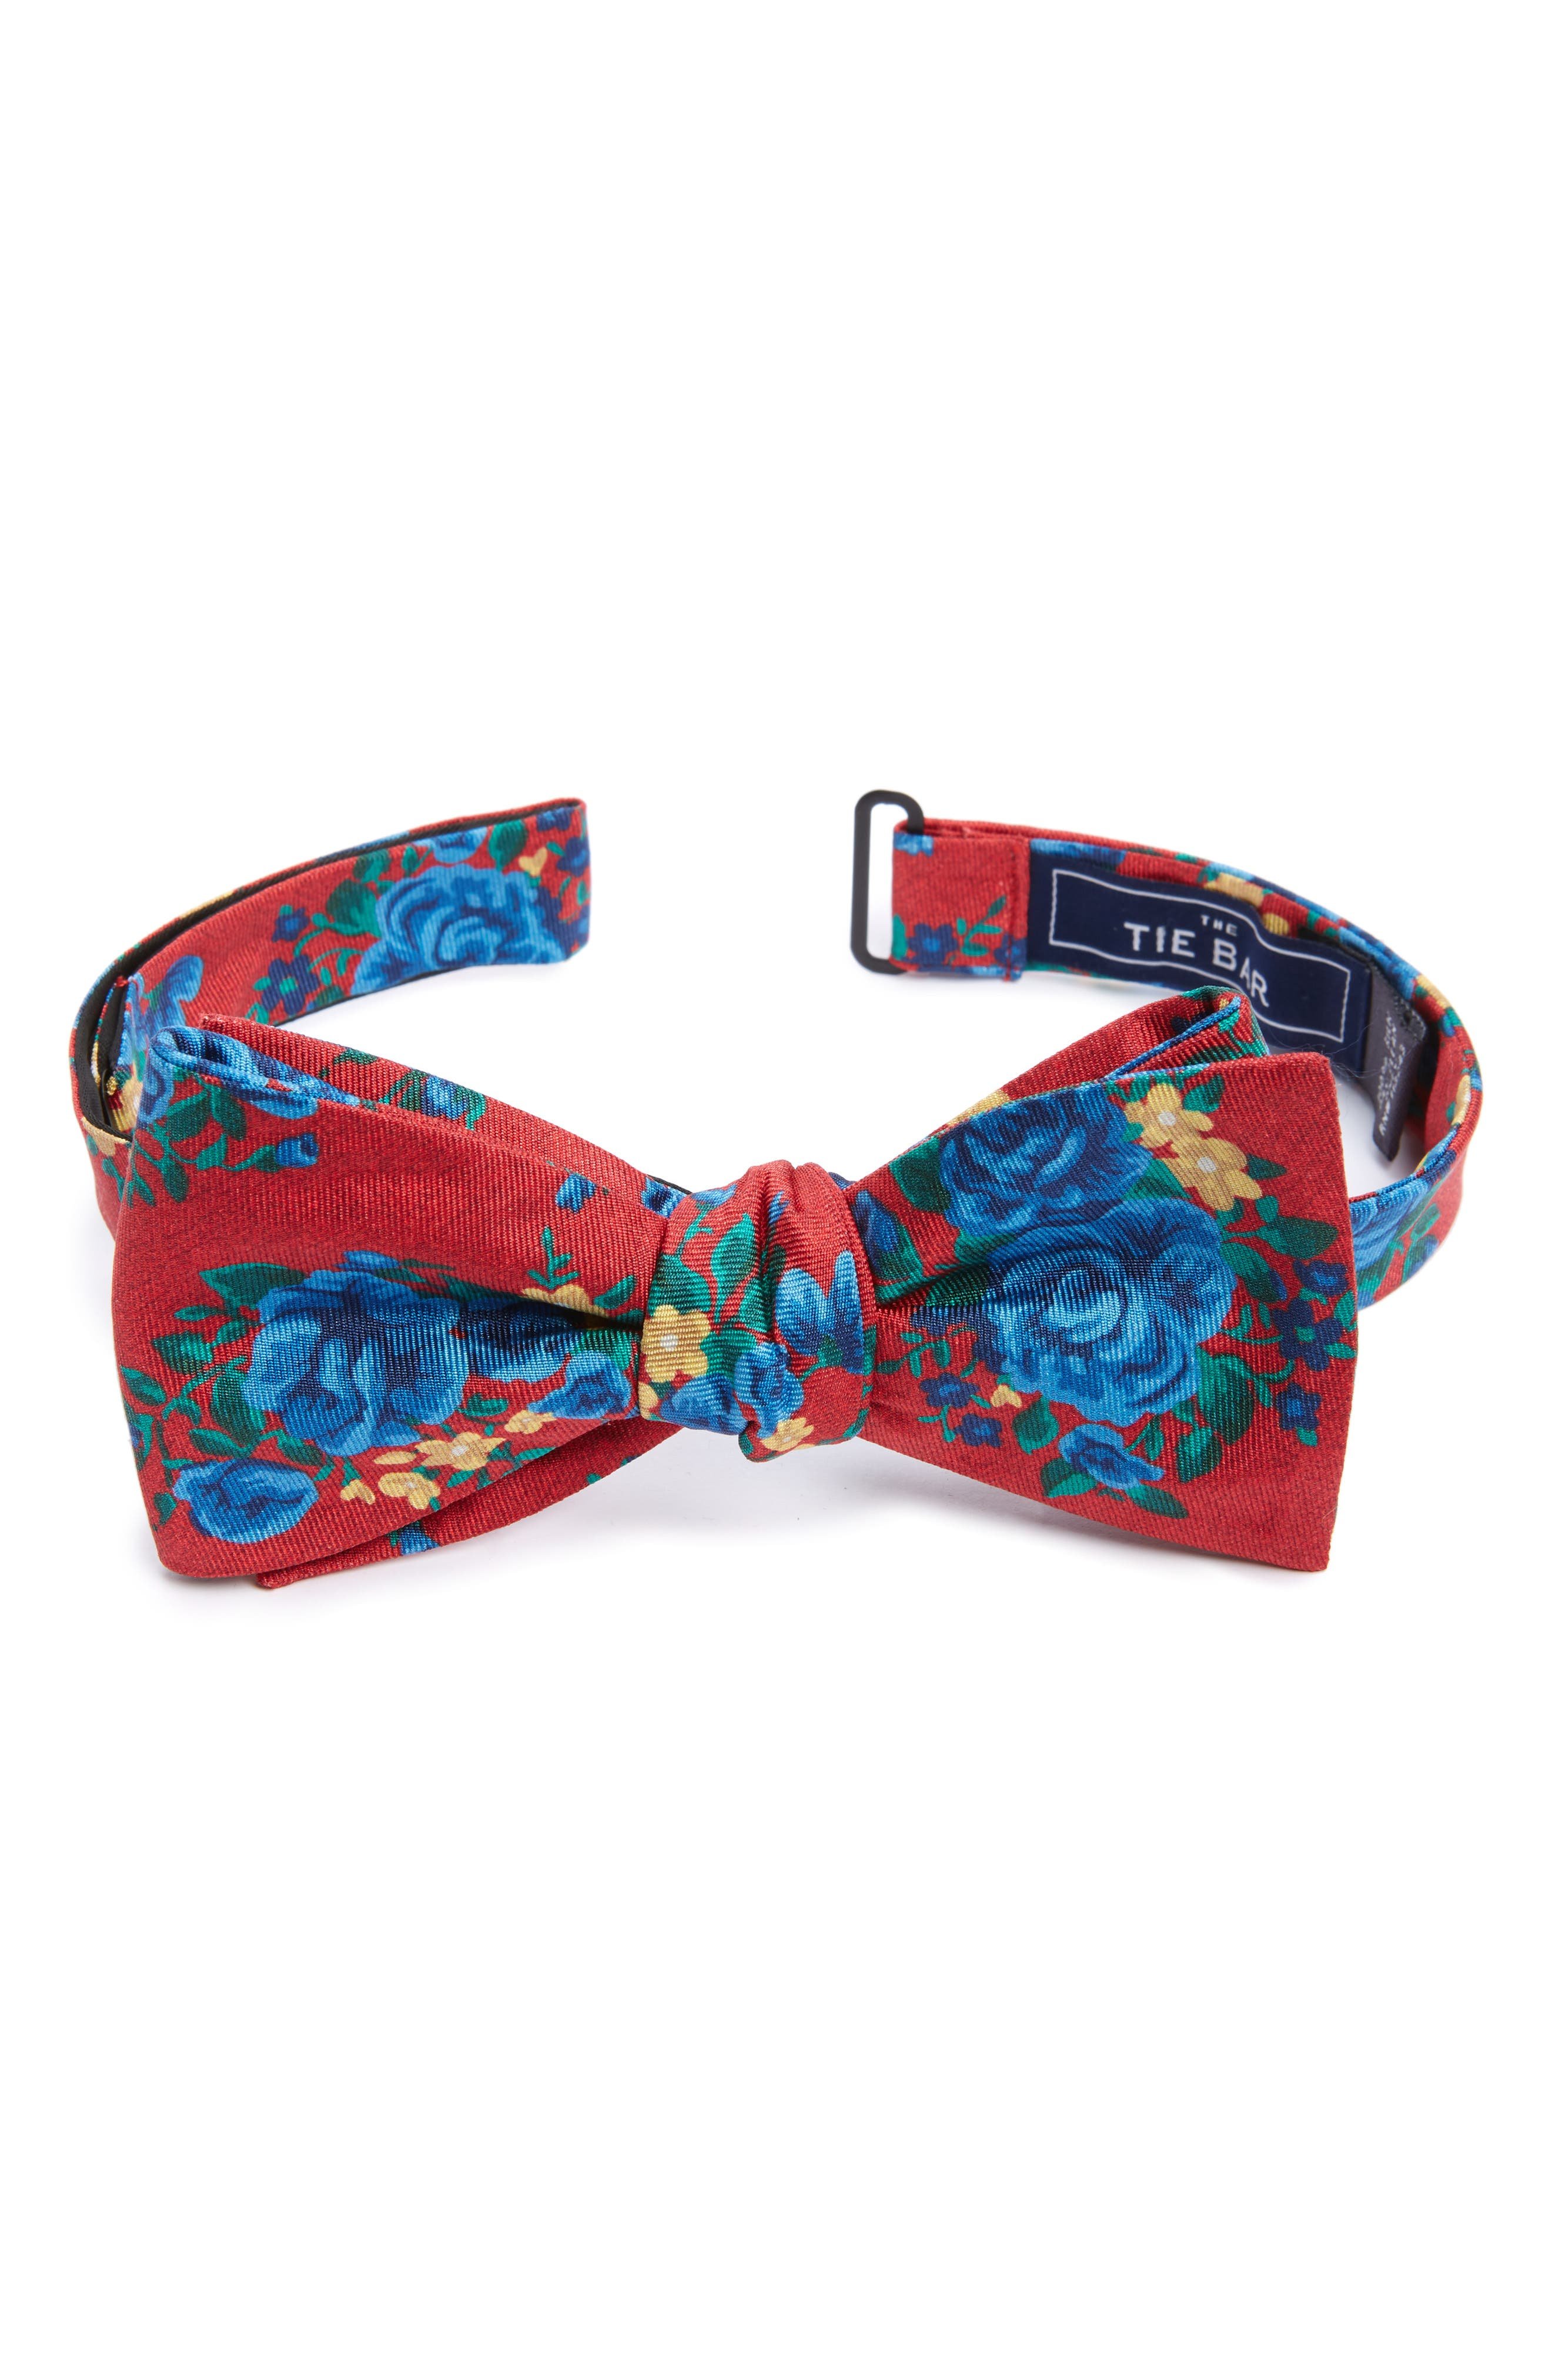 The Tie Bar Hinterland Floral Silk Bow Tie